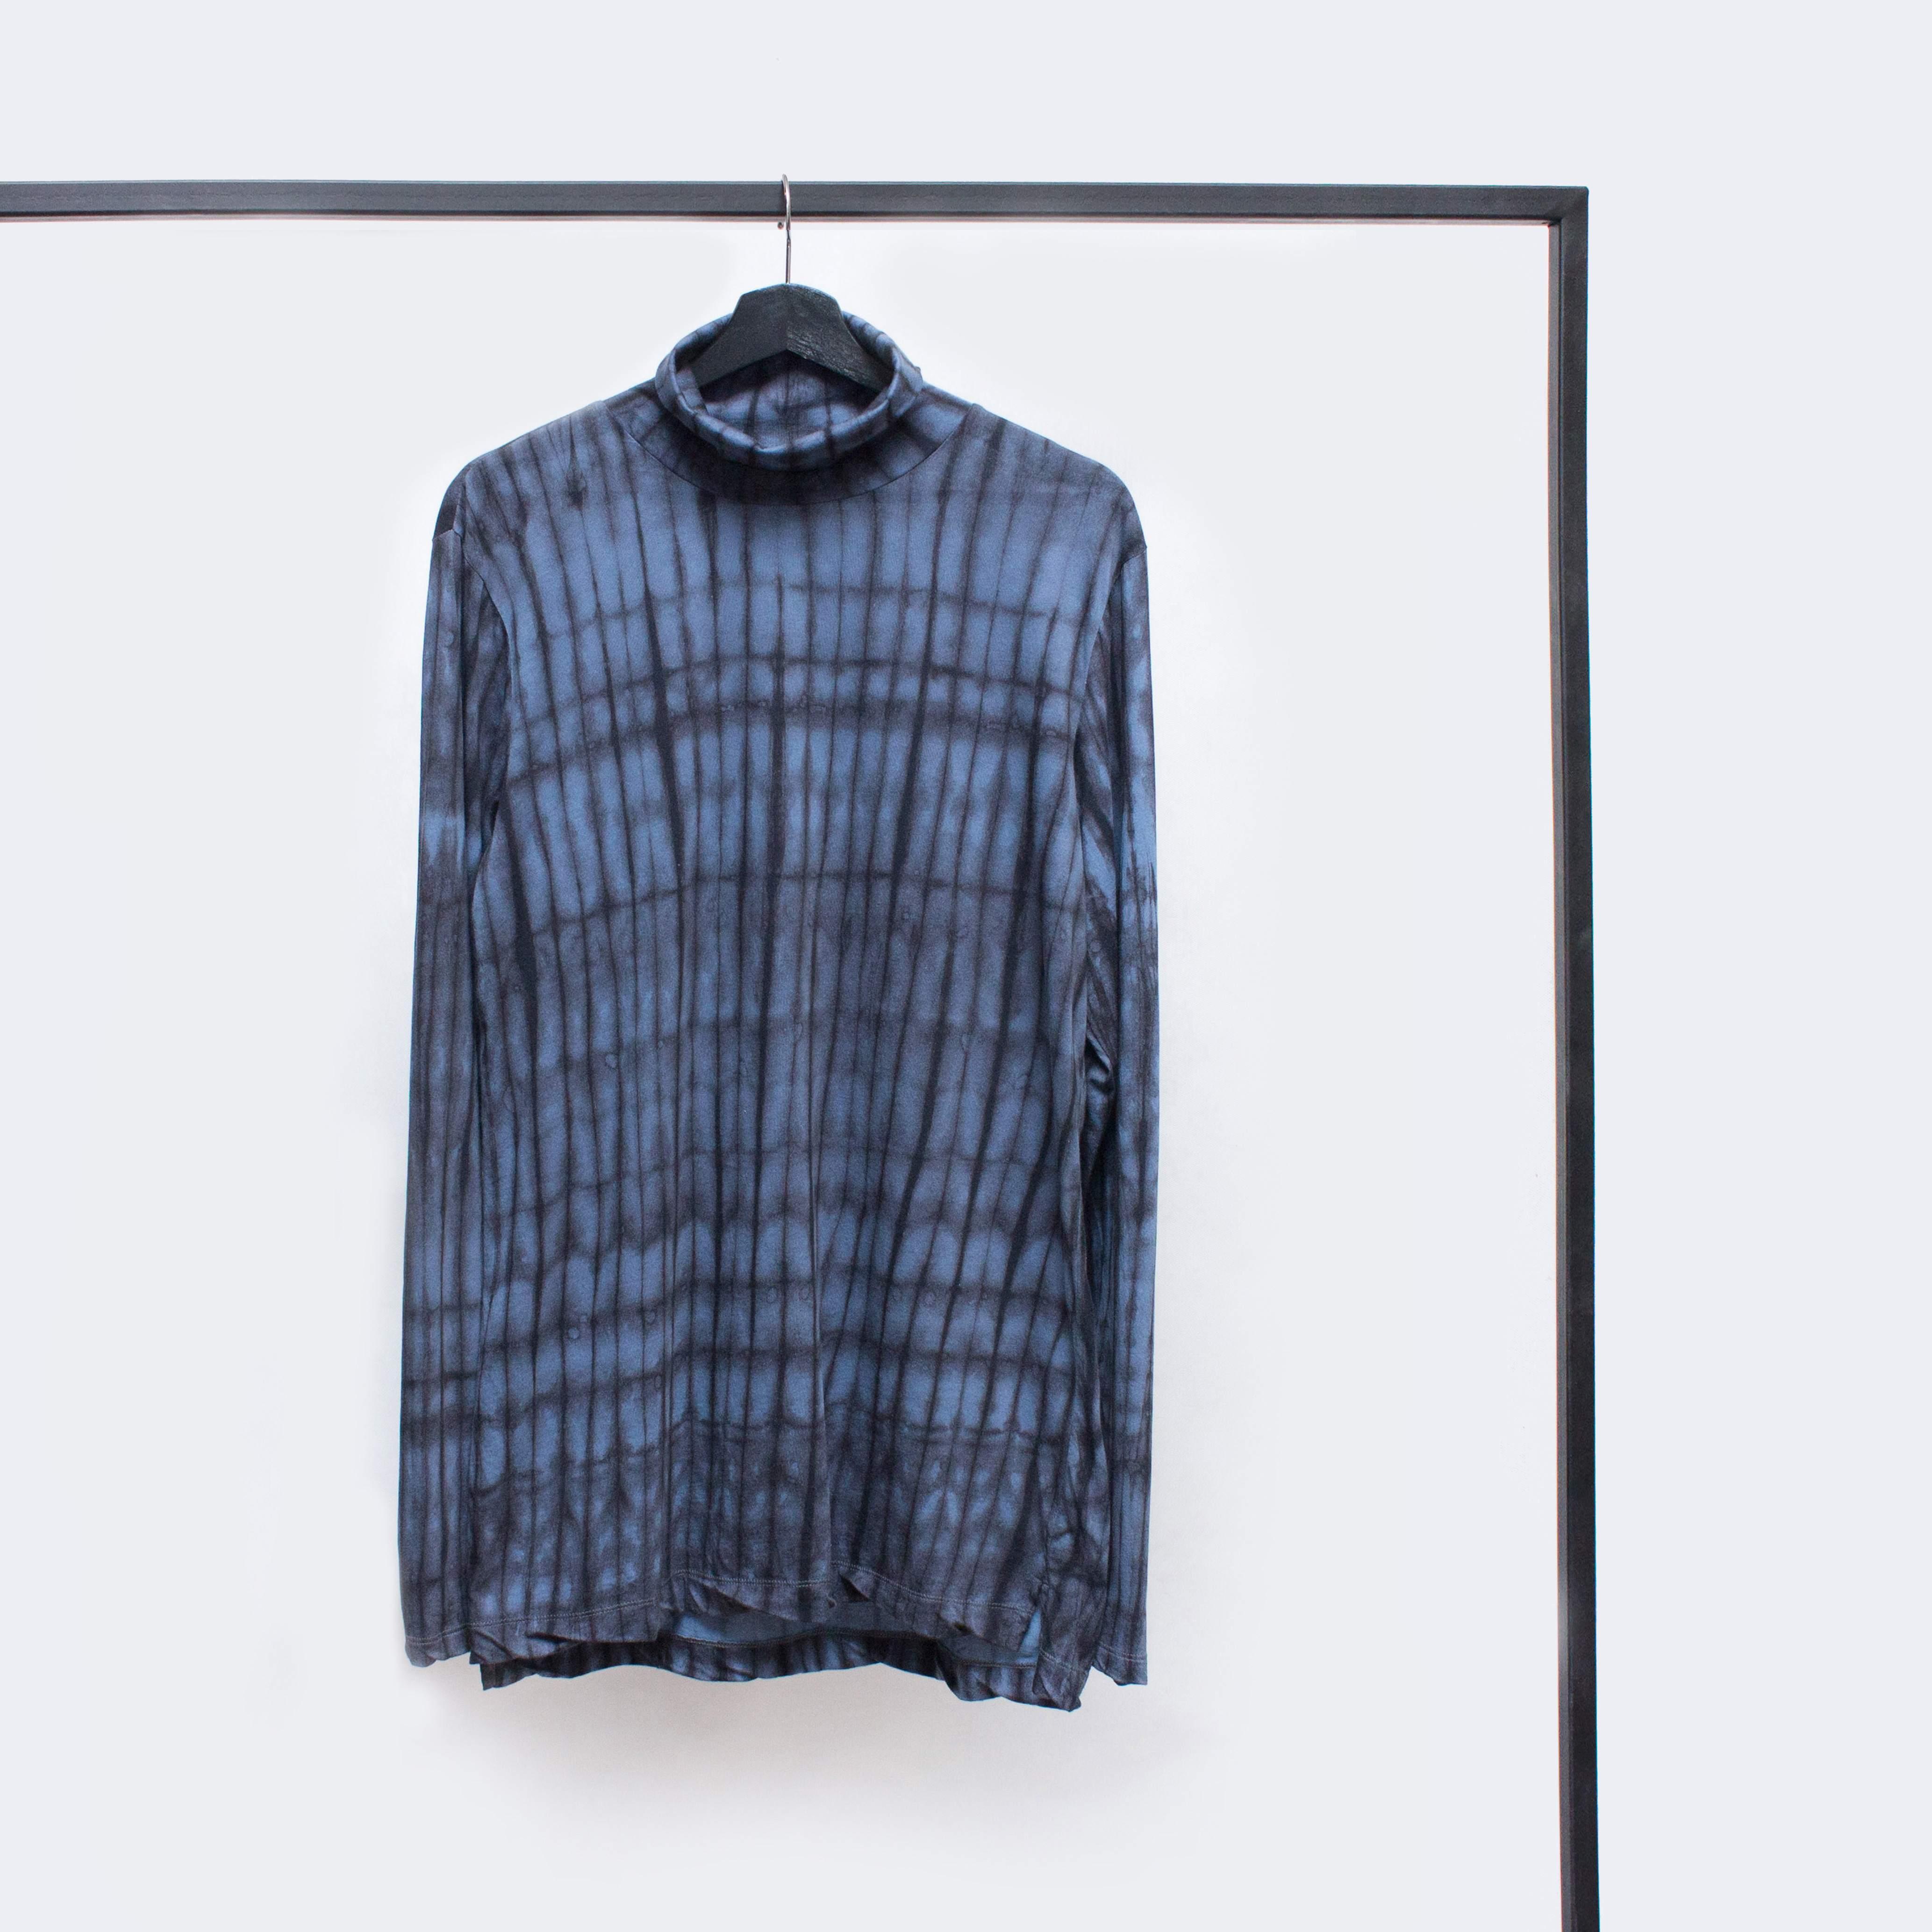 Dries Van Noten AW'14 tie-dyed oversized roll neck long sleeve